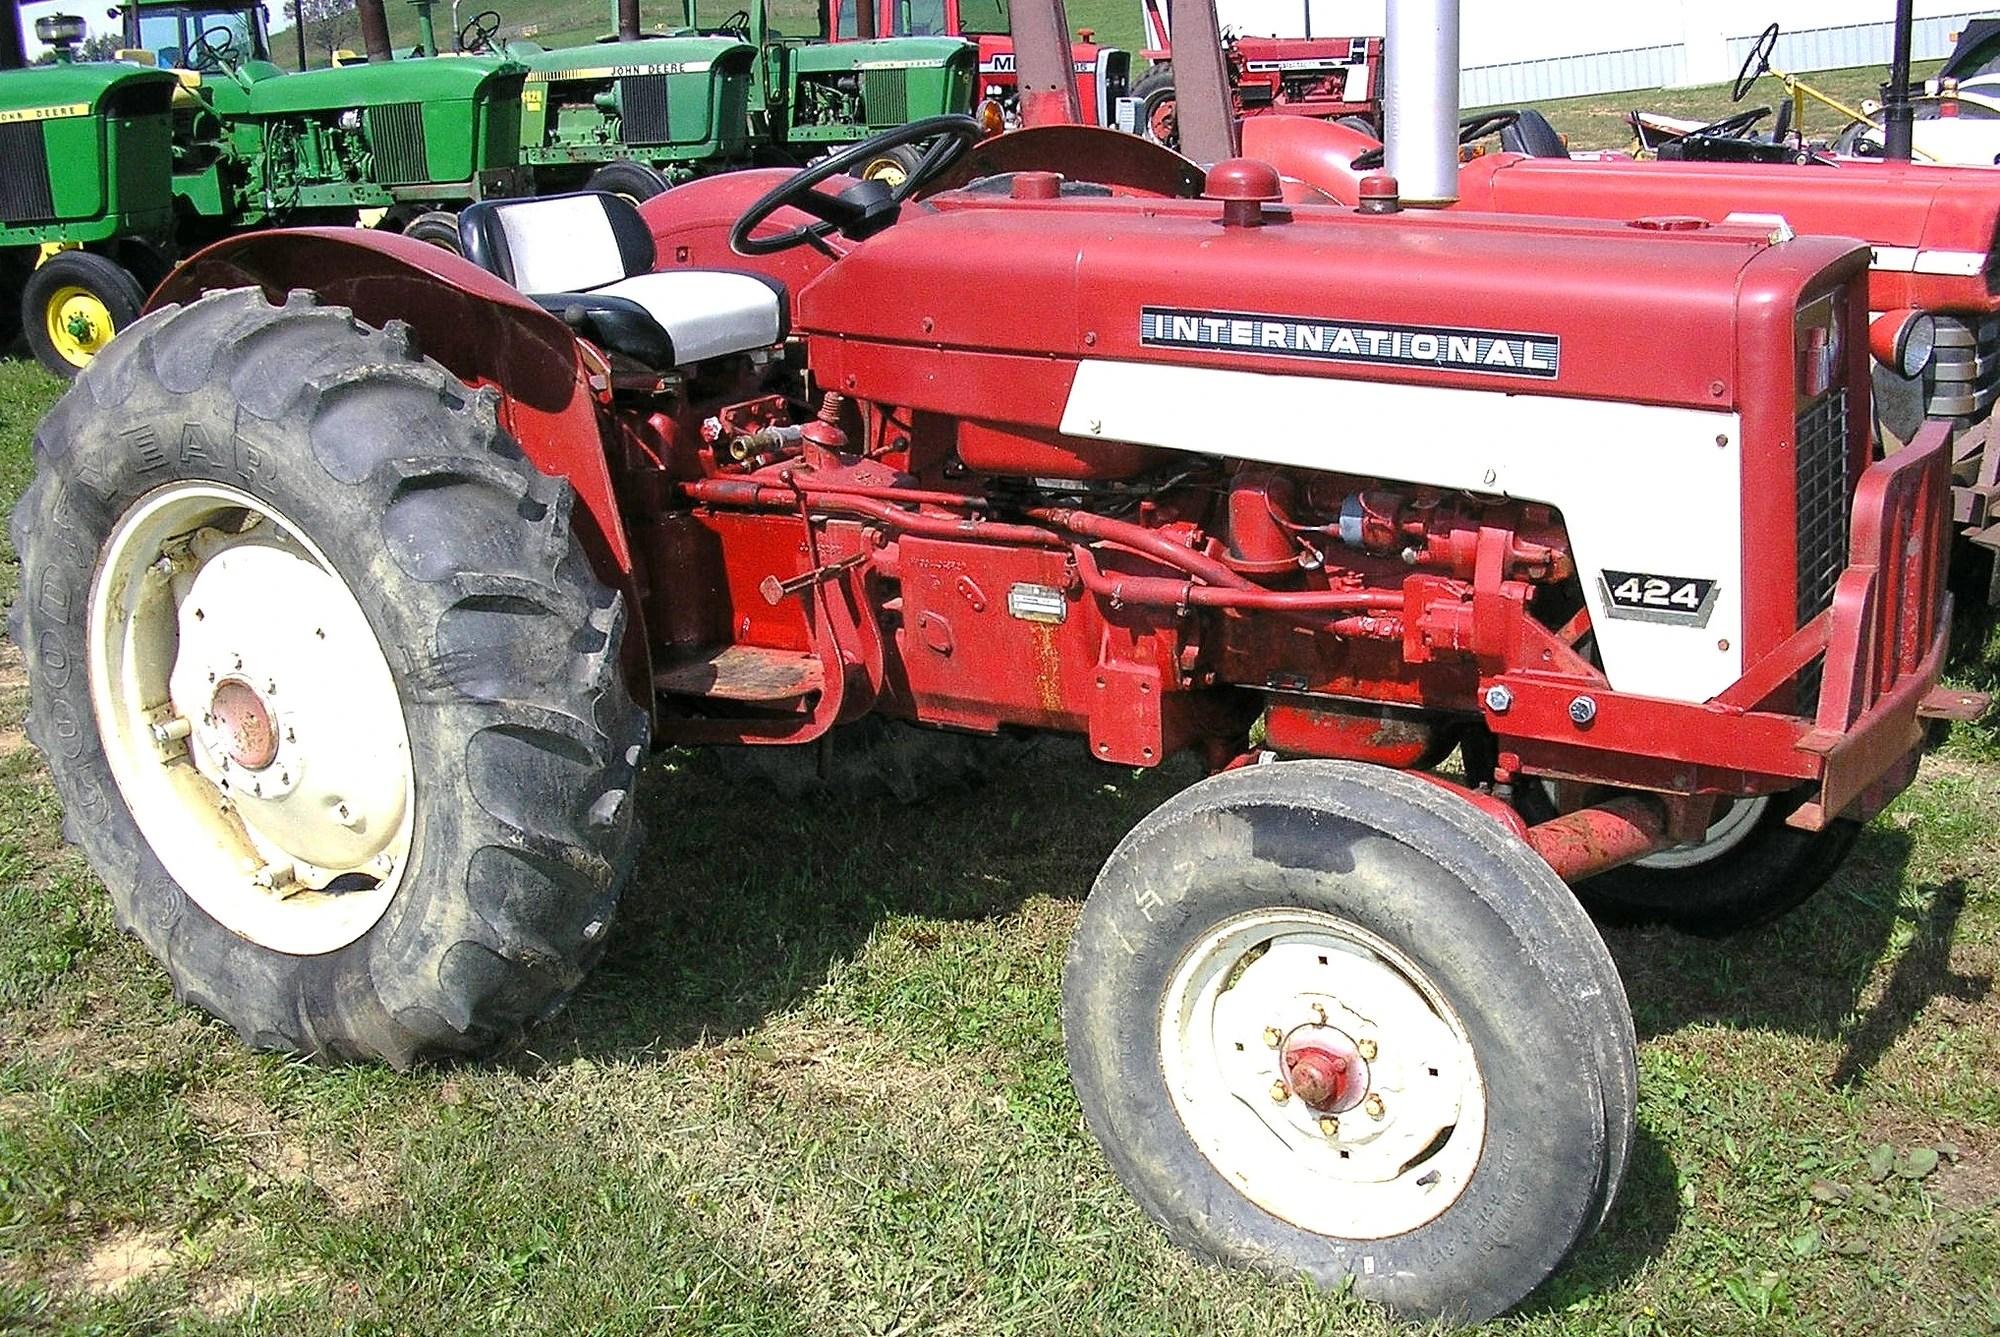 hight resolution of international harvester 424 tractor construction plant wiki international harvester 454 tractor on 806 farmall pto parts diagram